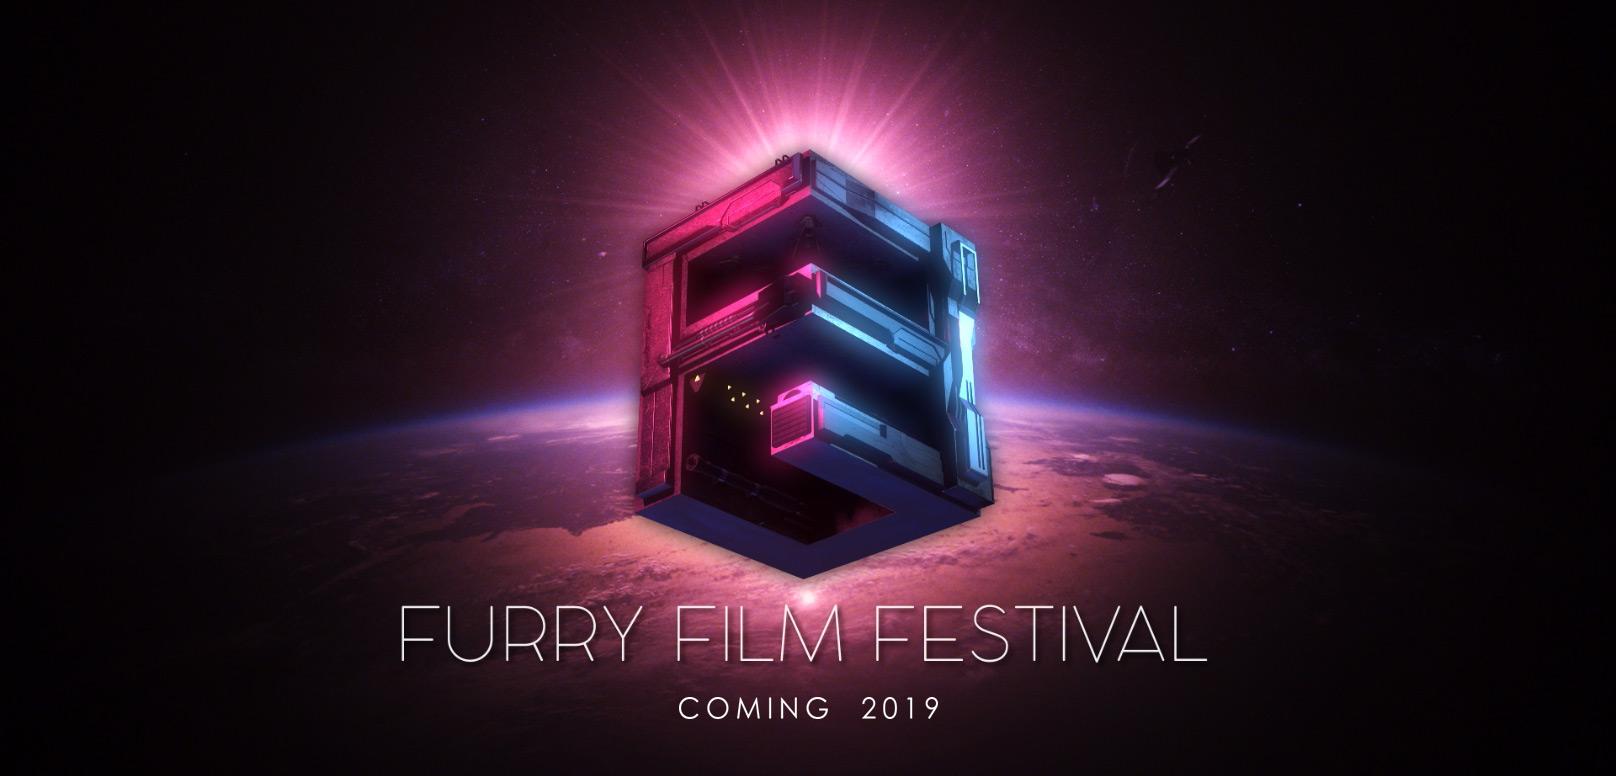 Furry Film Festival (F3)